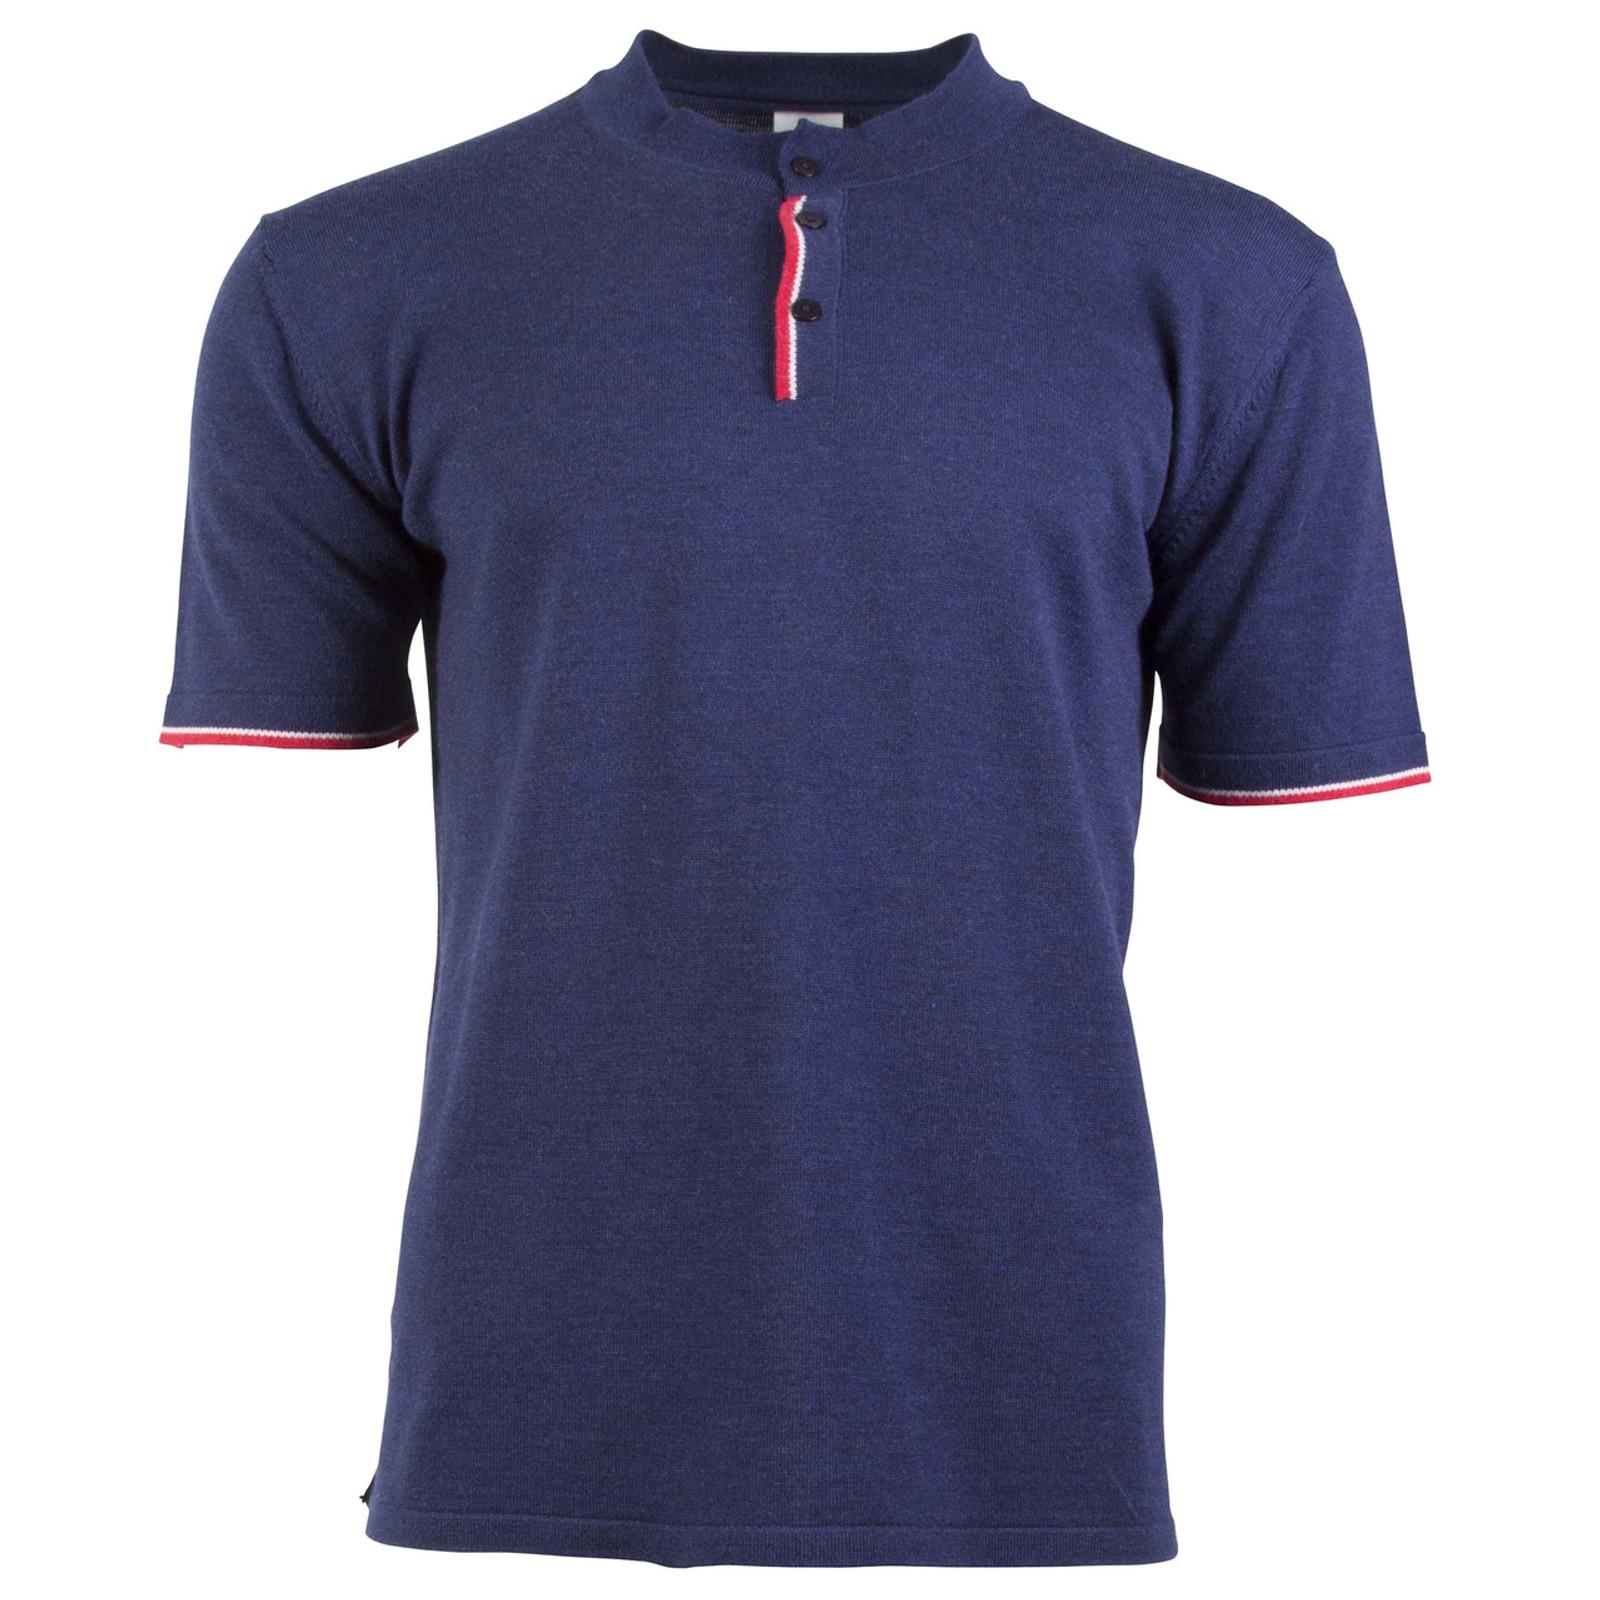 Dale of Norway Fredrik Men's T-shirt, in Navy/Off White Mel/Raspberry, 93771-C